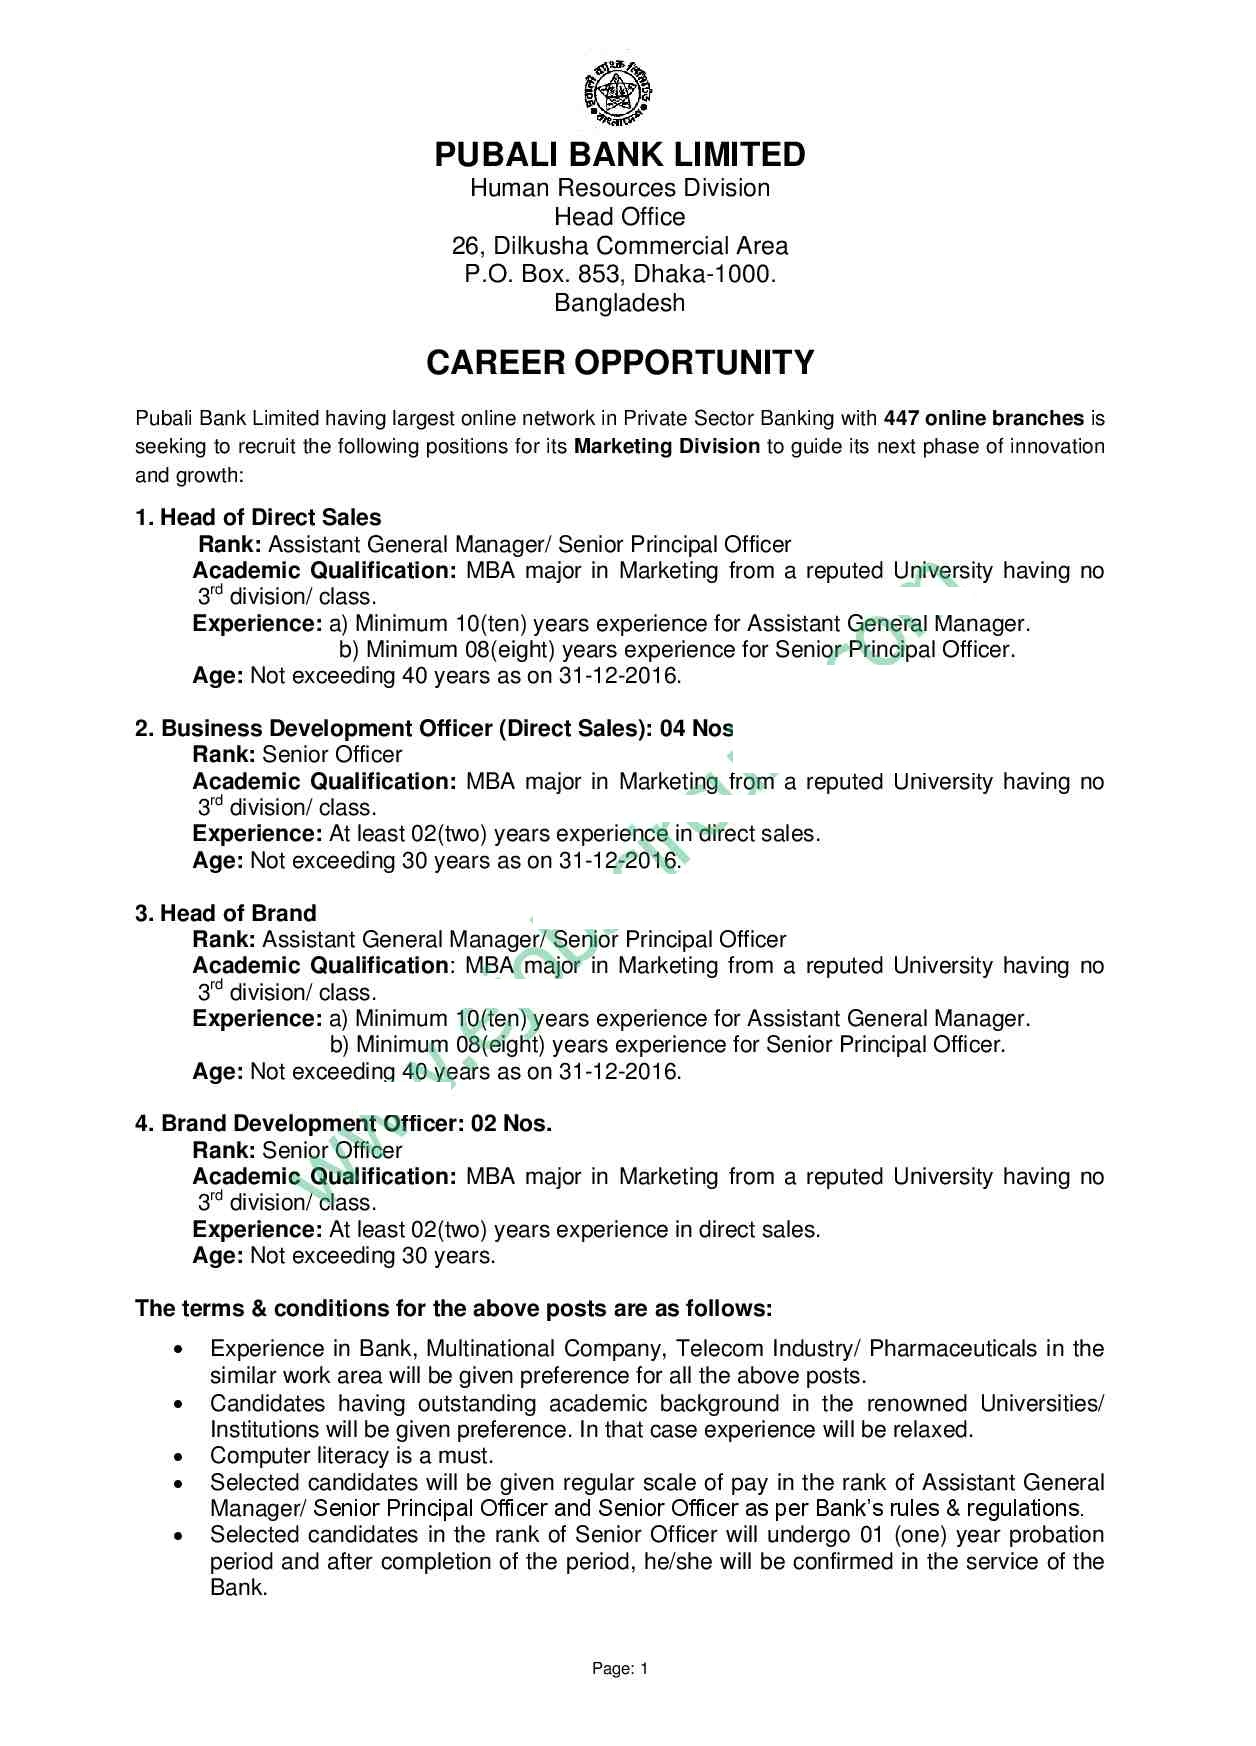 pubali bank limited jobs circular bd jobs careers pubali bank limited jobs circular 2017